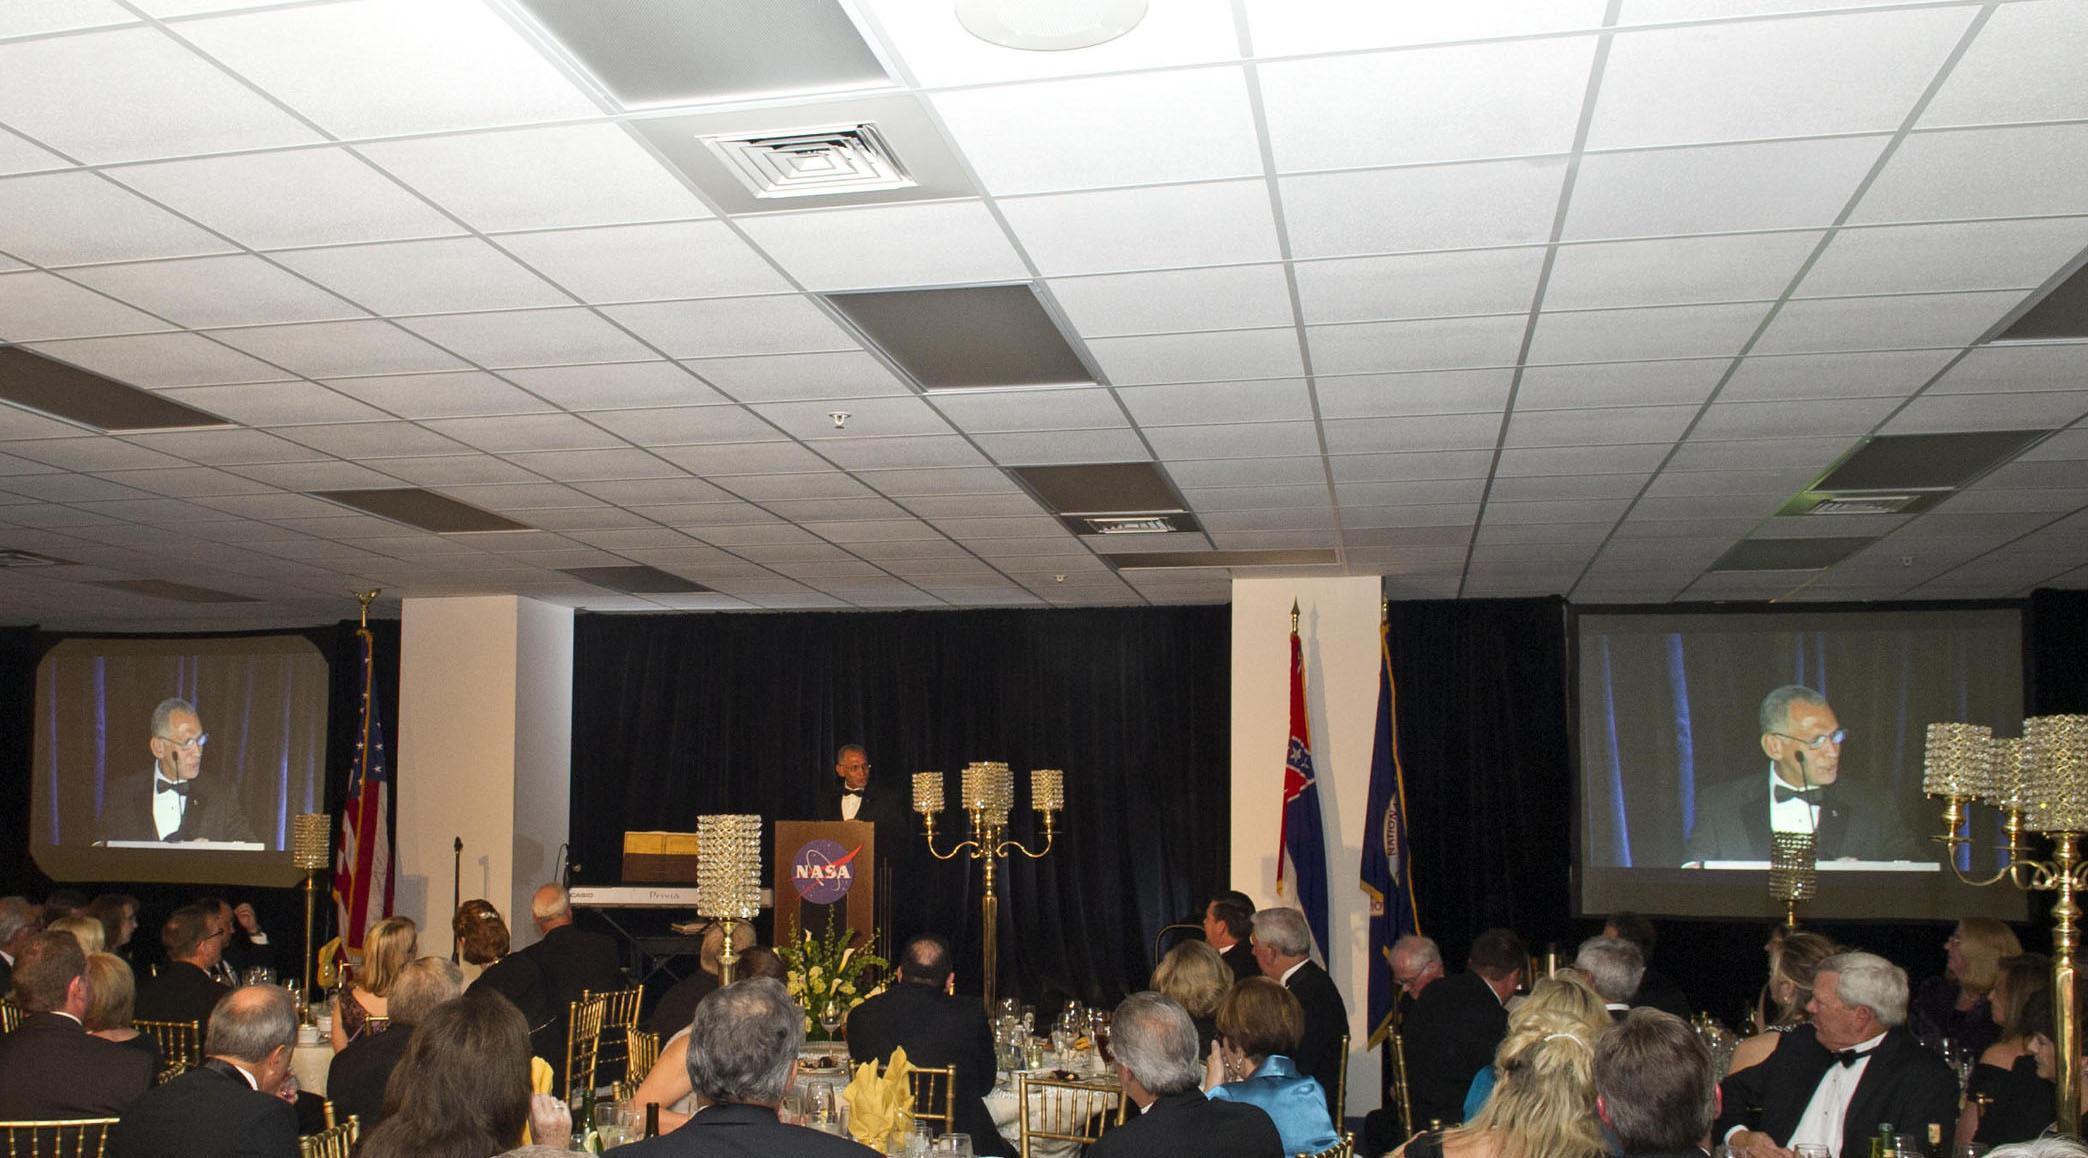 nasa podium - photo #9